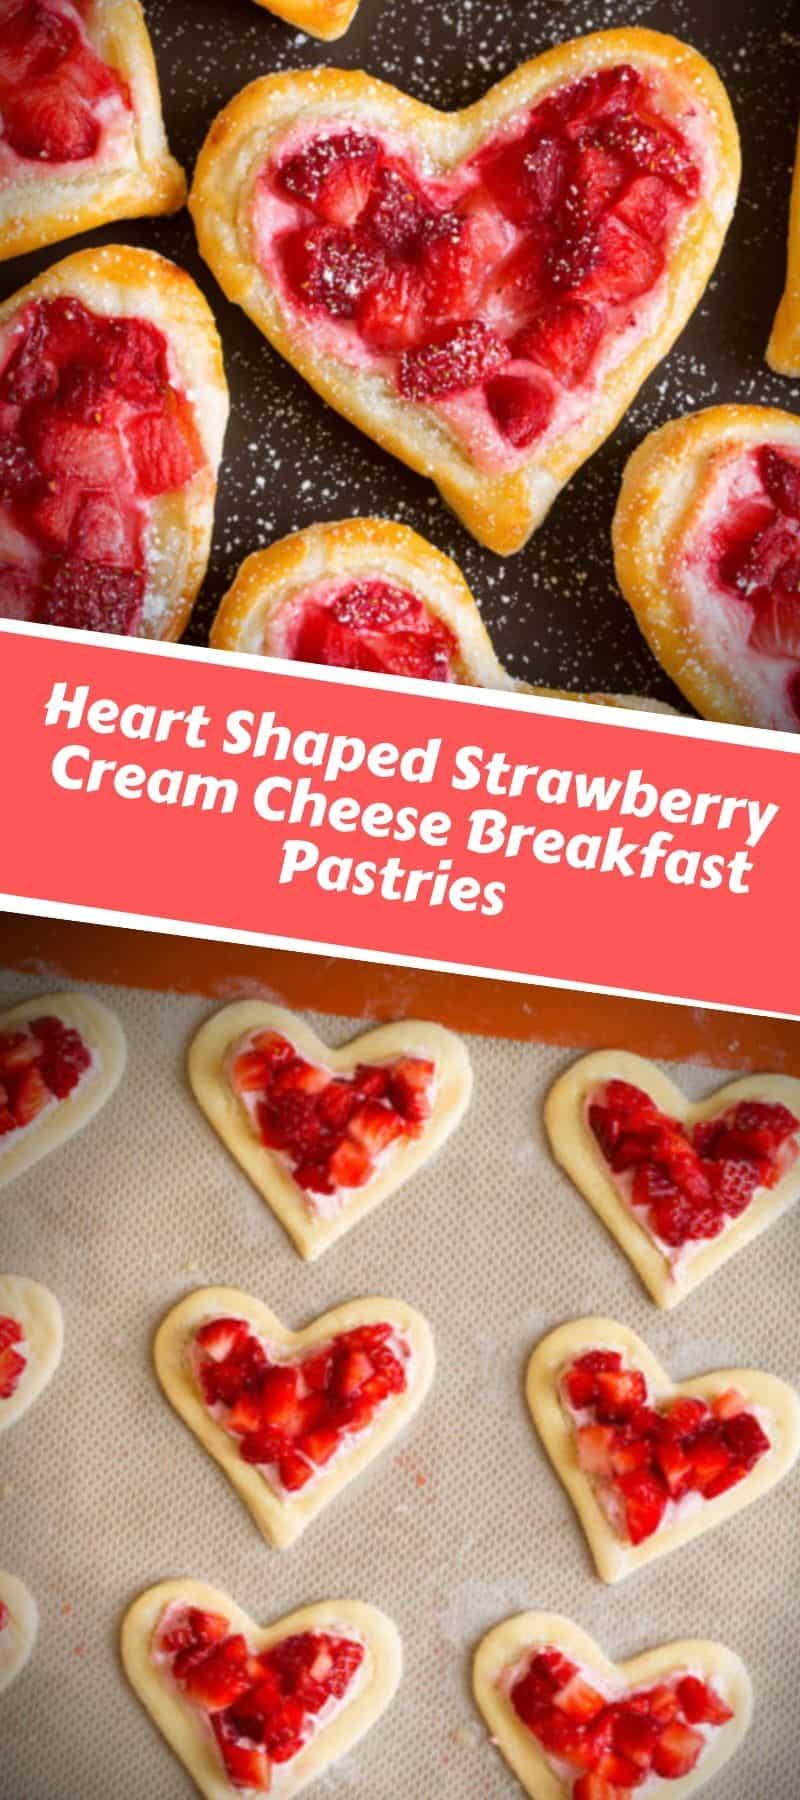 Heart Shaped Strawberry Cream Cheese Breakfast Pastries 3